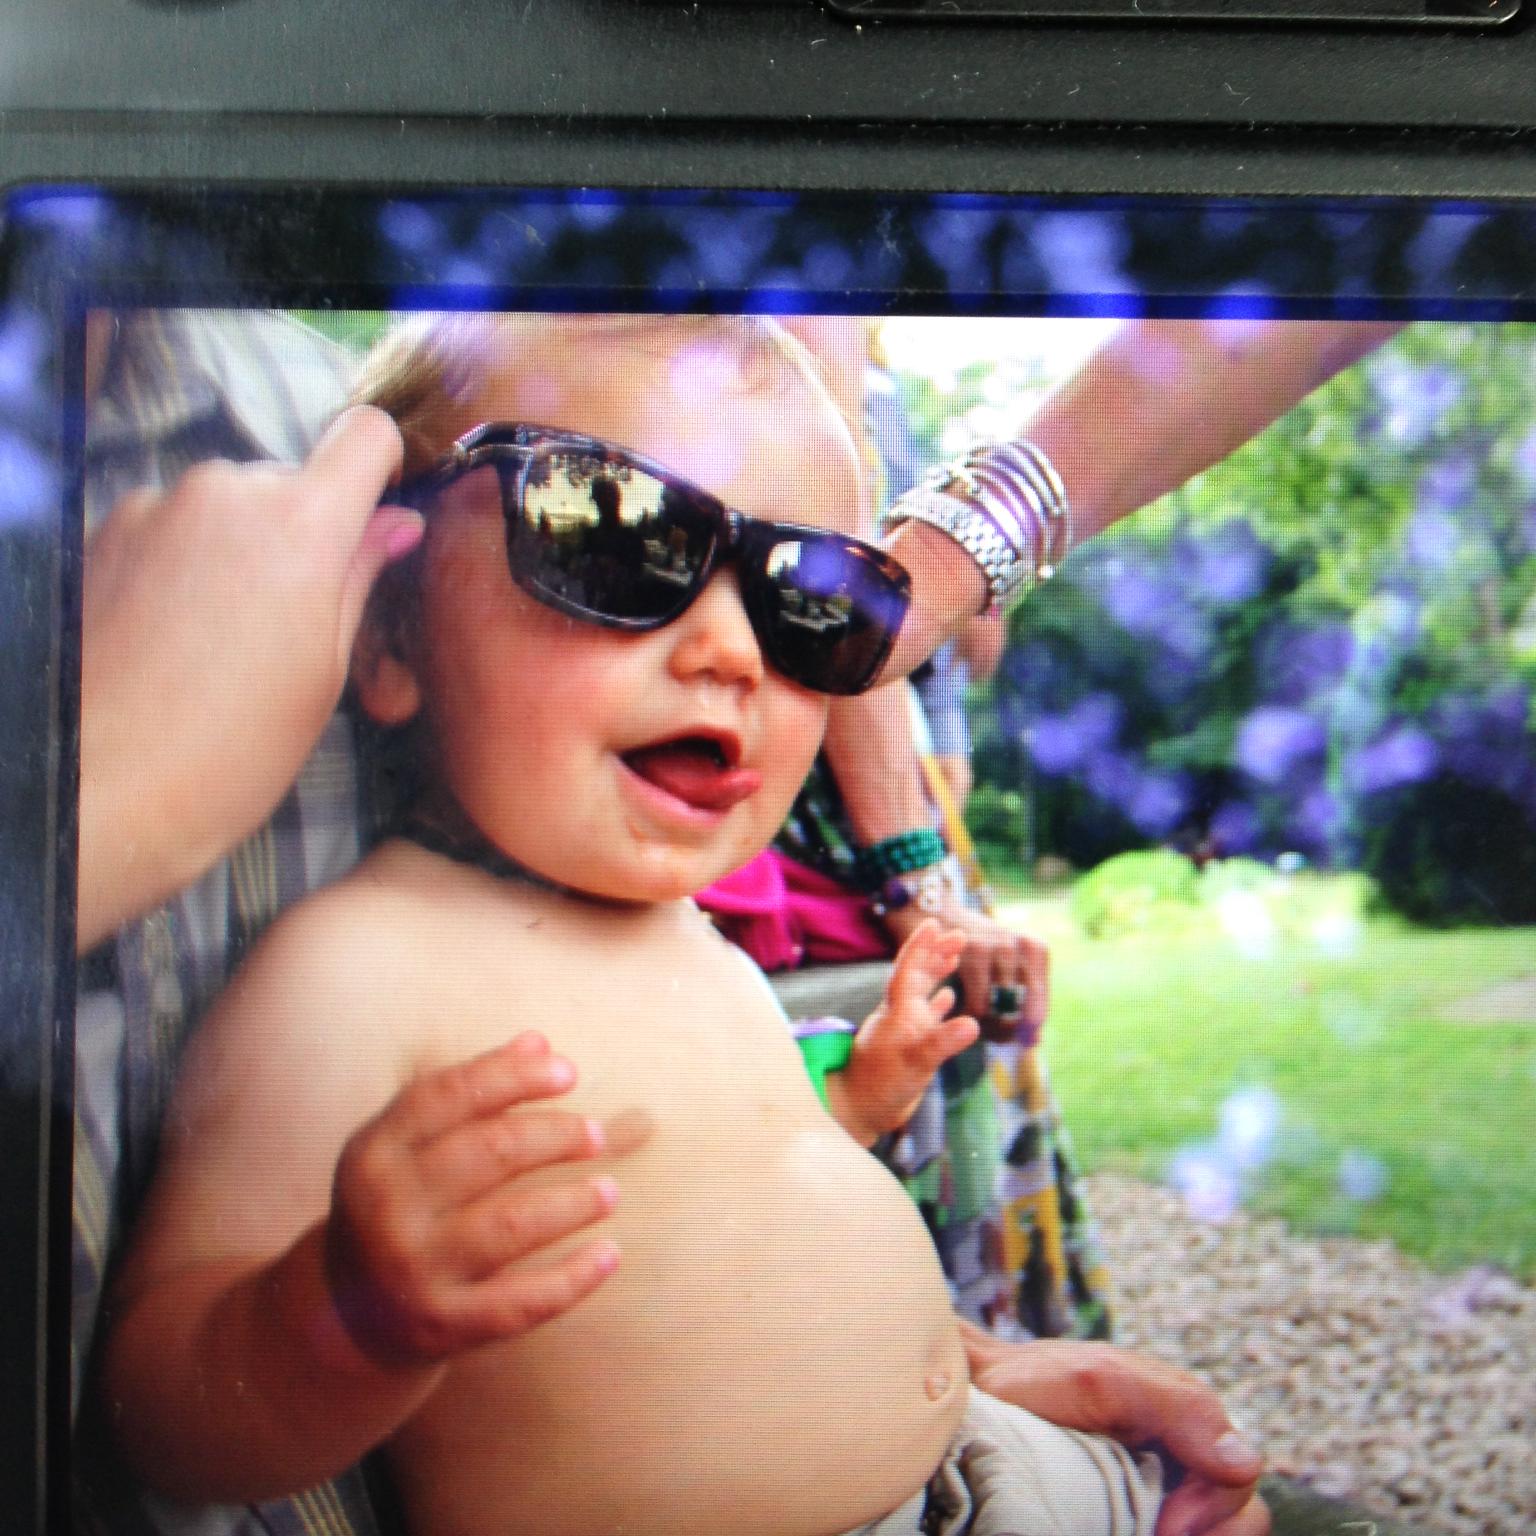 baby-alue-optics-six.jpg